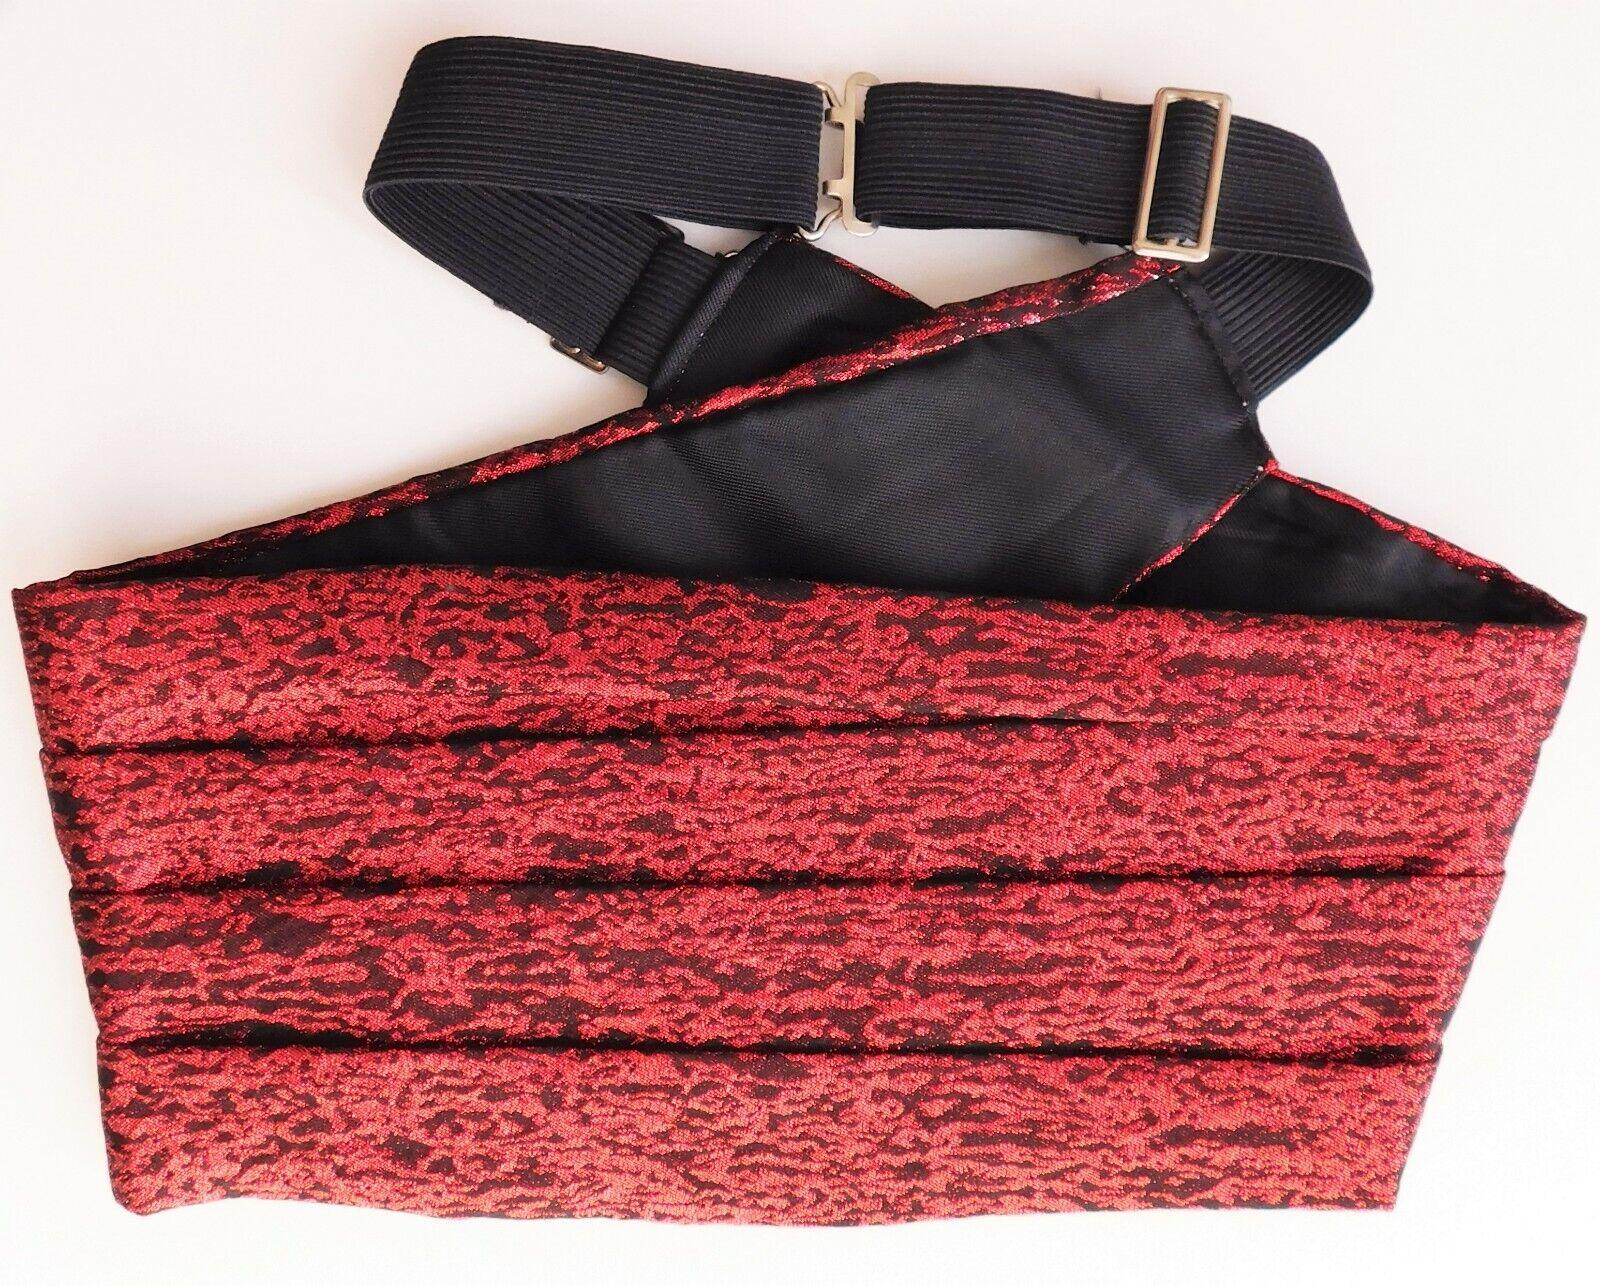 Vintage 1970s Akco cummerbund glam rock glittery red evening tuxedo dress wear